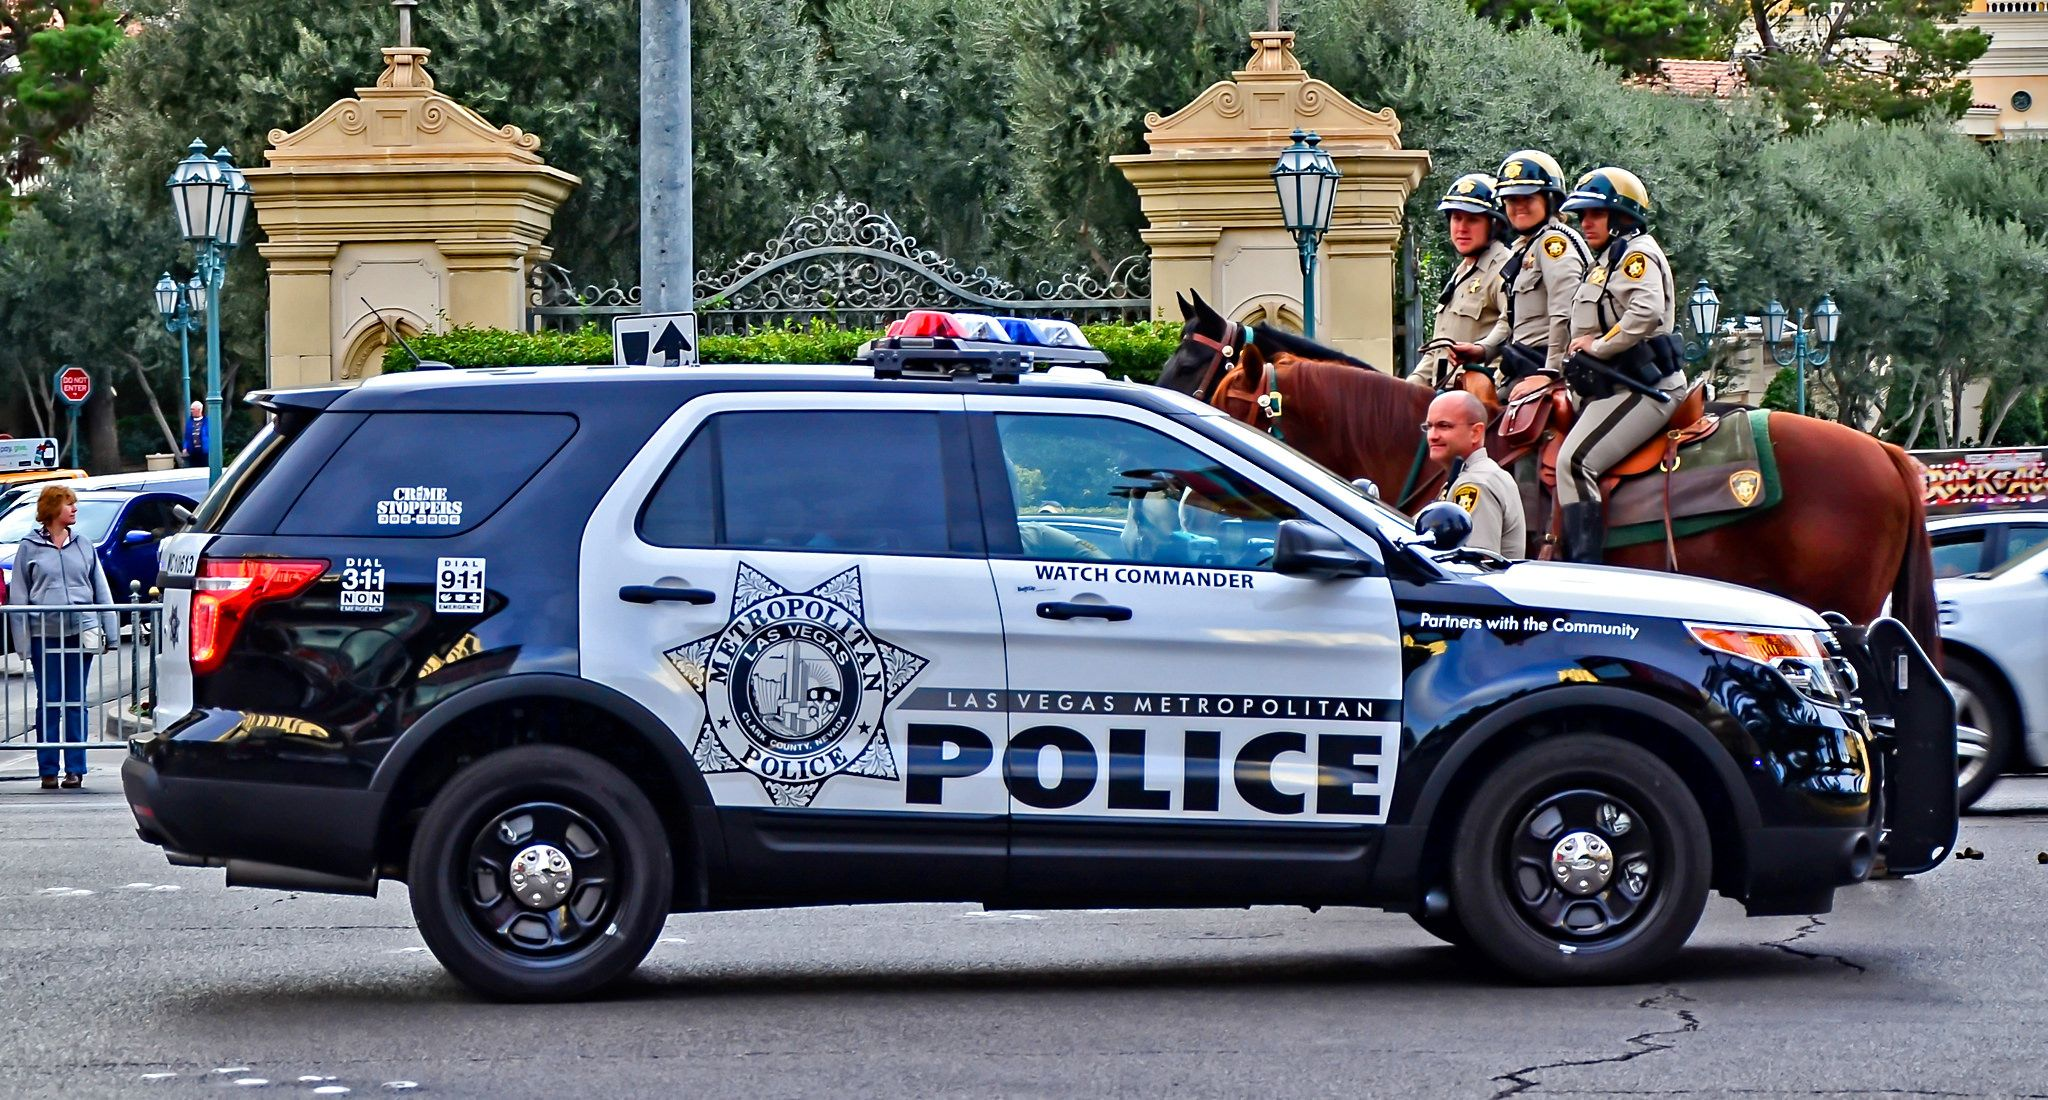 Las Vegas Metropolitan Police Watch Commander Police Cars Old Police Cars Police